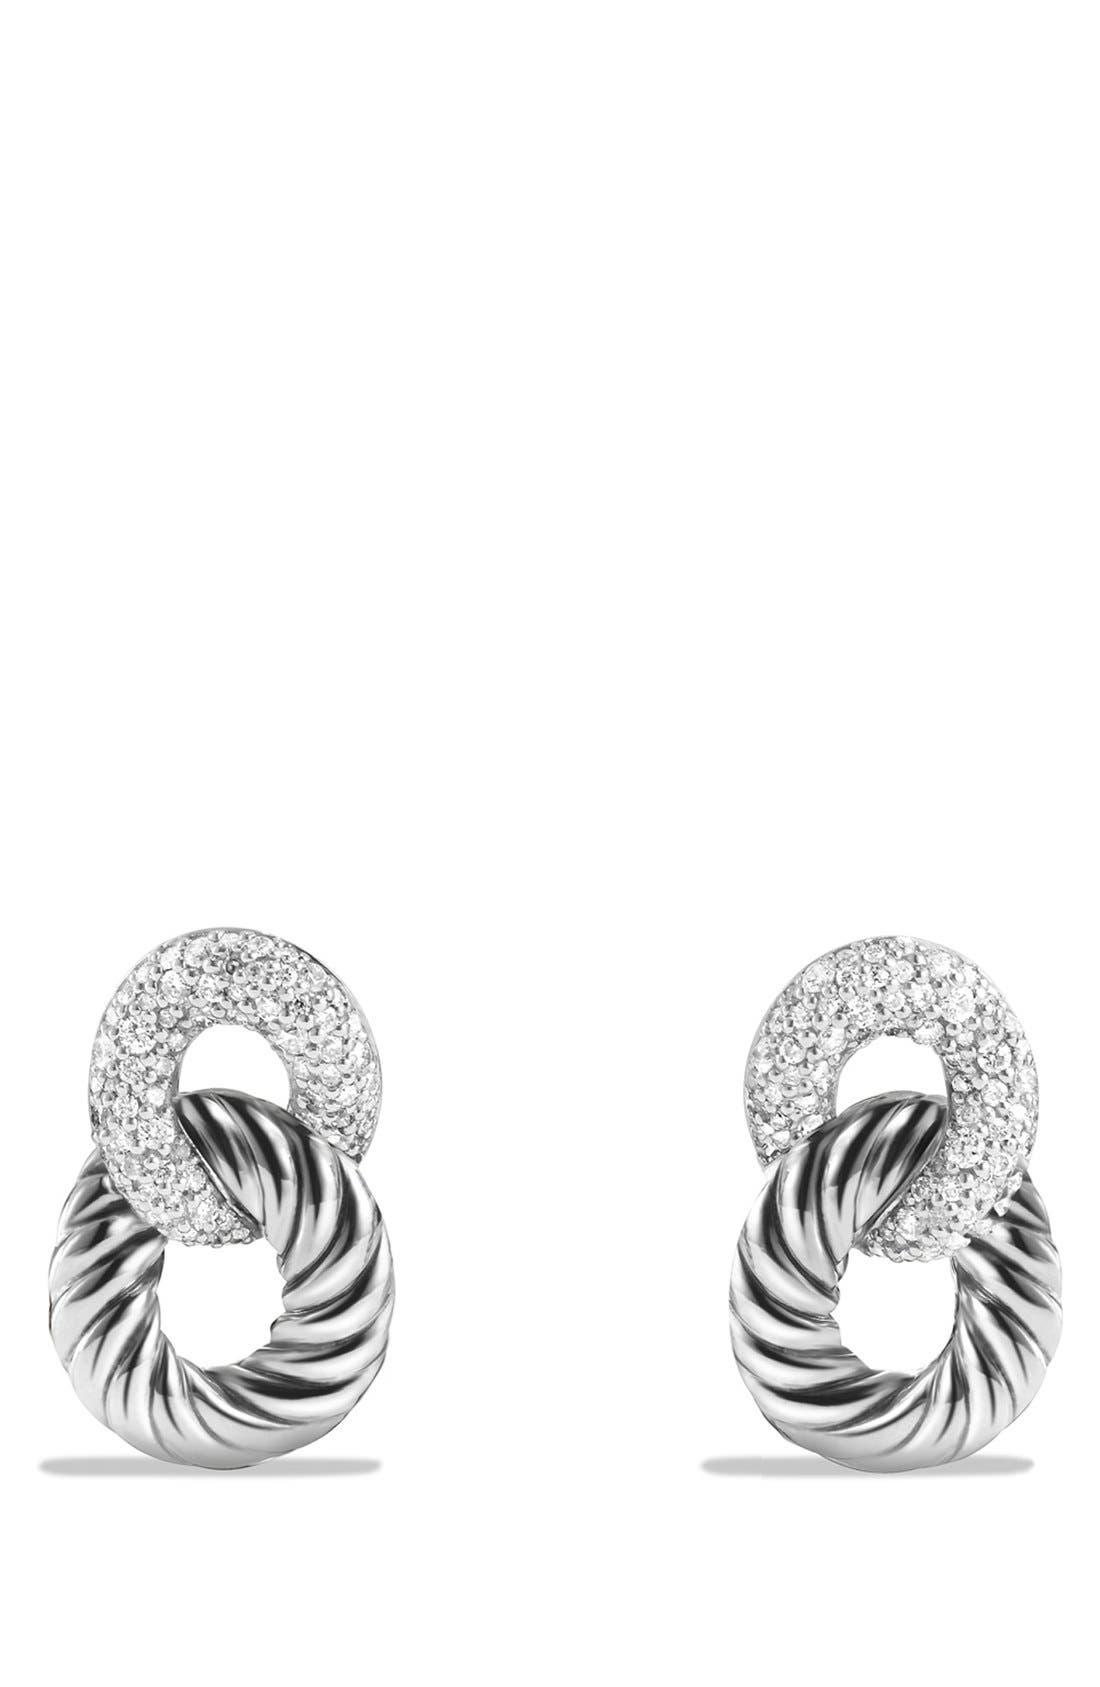 Main Image - David Yurman'Belmont Curb Link' Drop Earrings with Diamonds